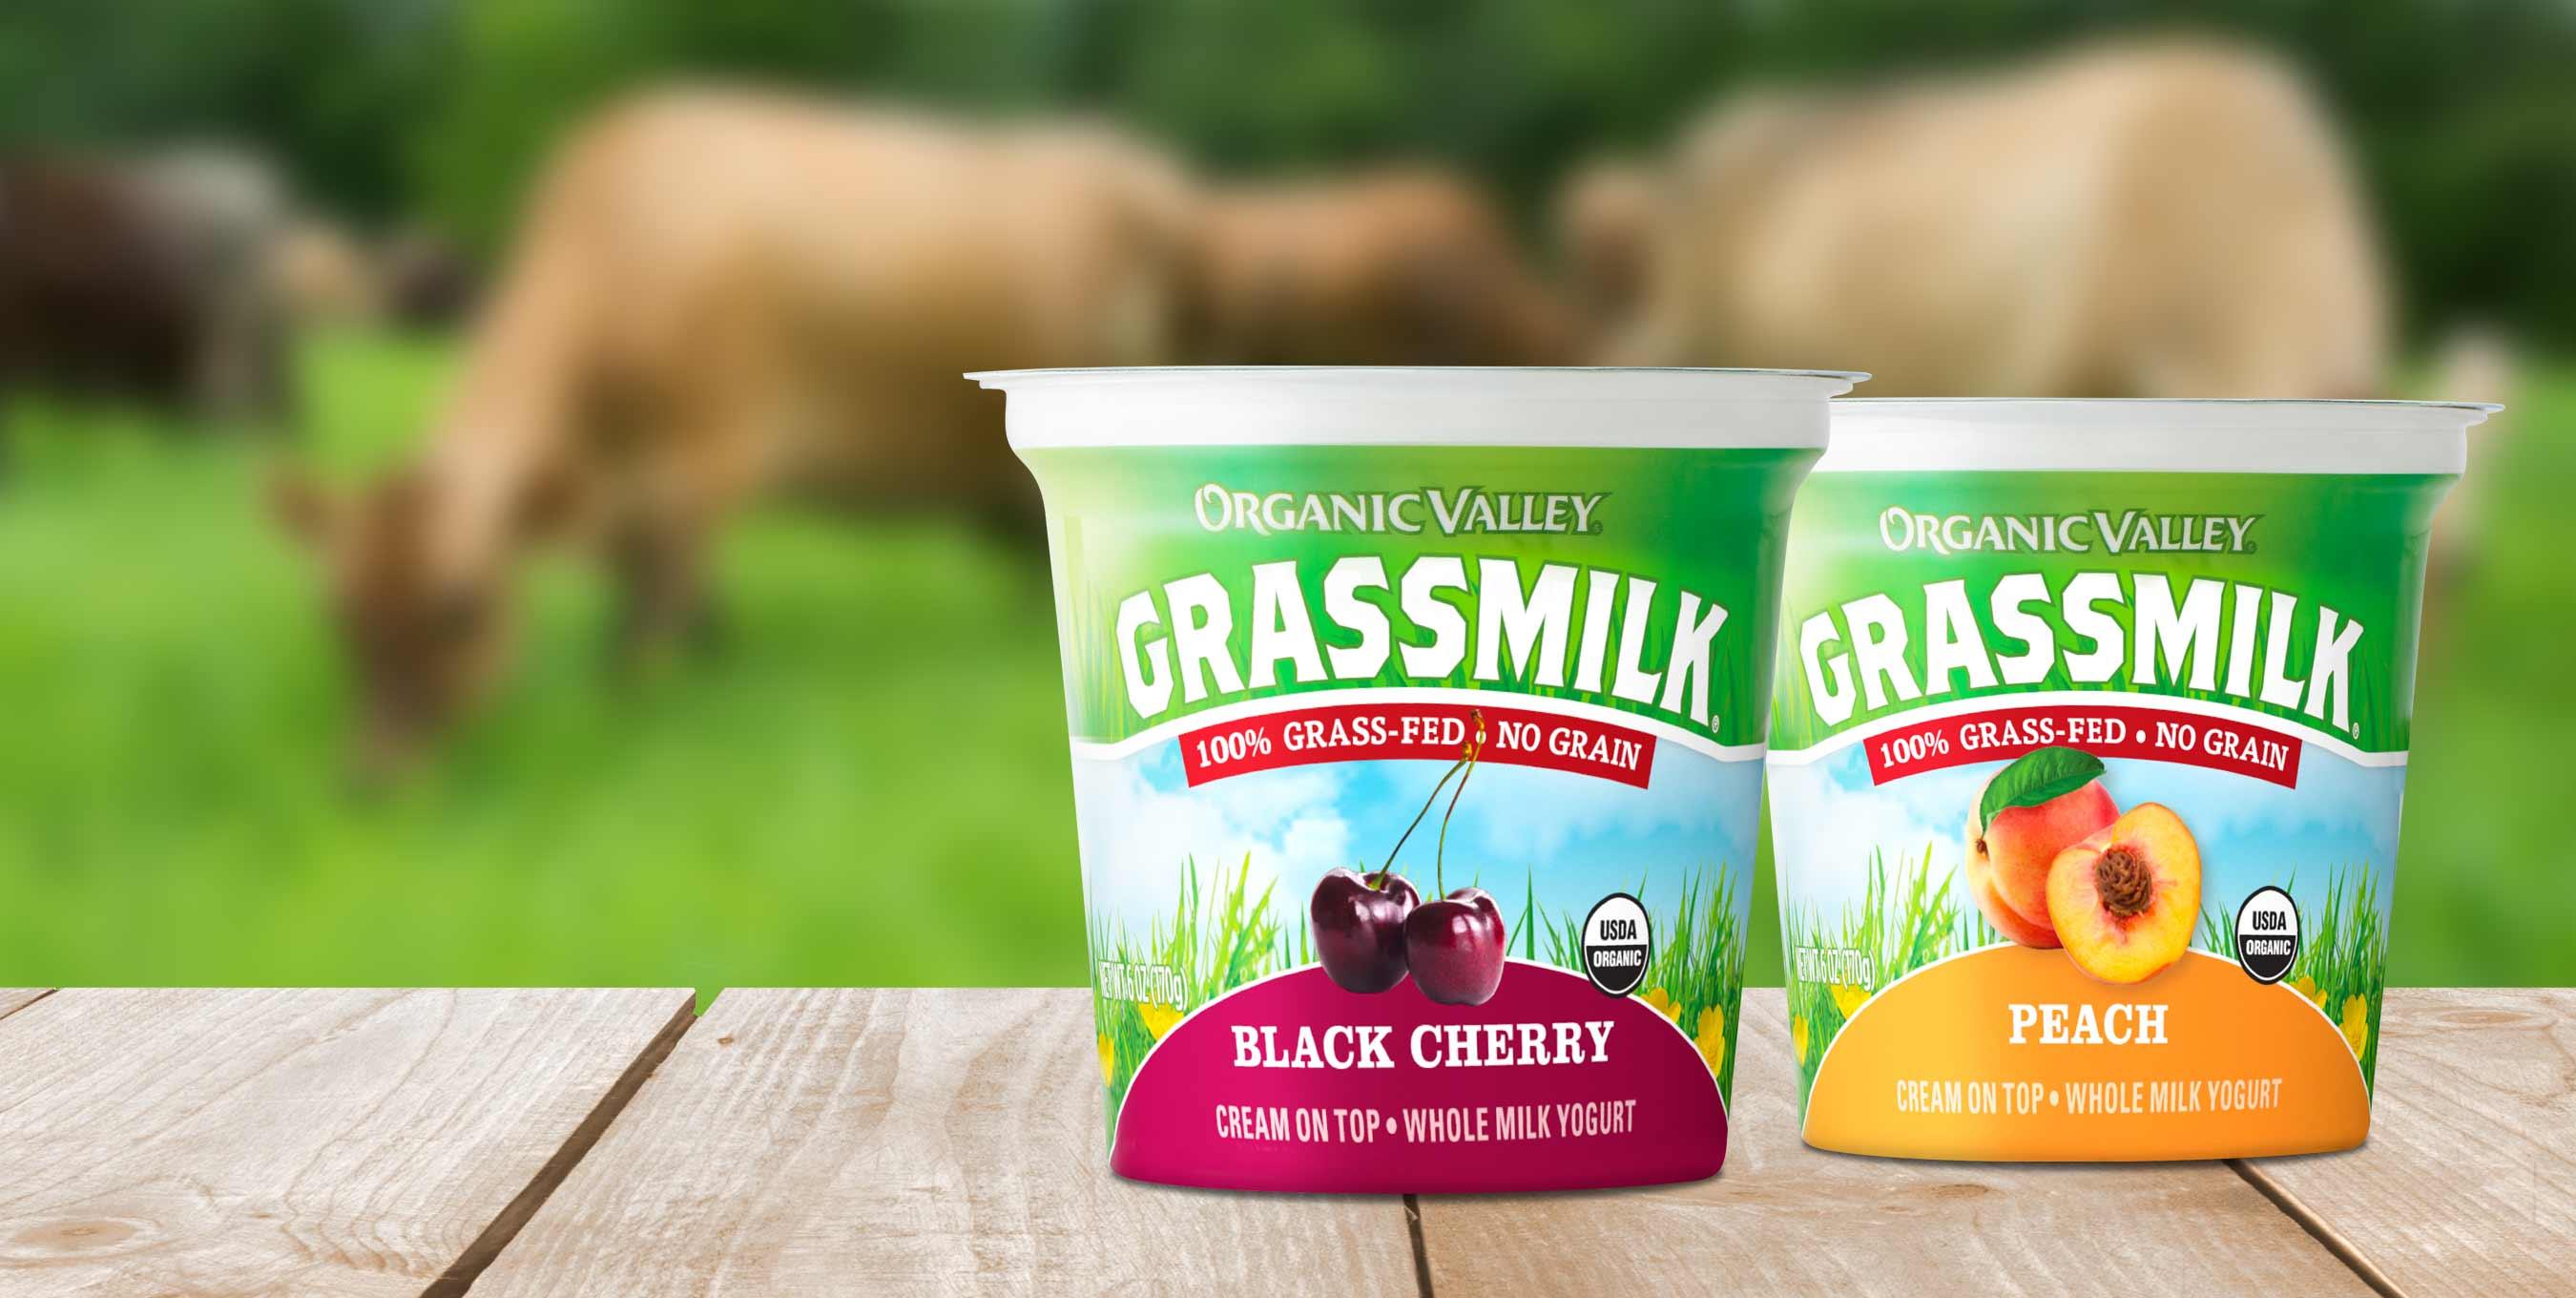 Organic Valley Introduces New Grassmilk® Yogurt Flavors: Black Cherry and Peach